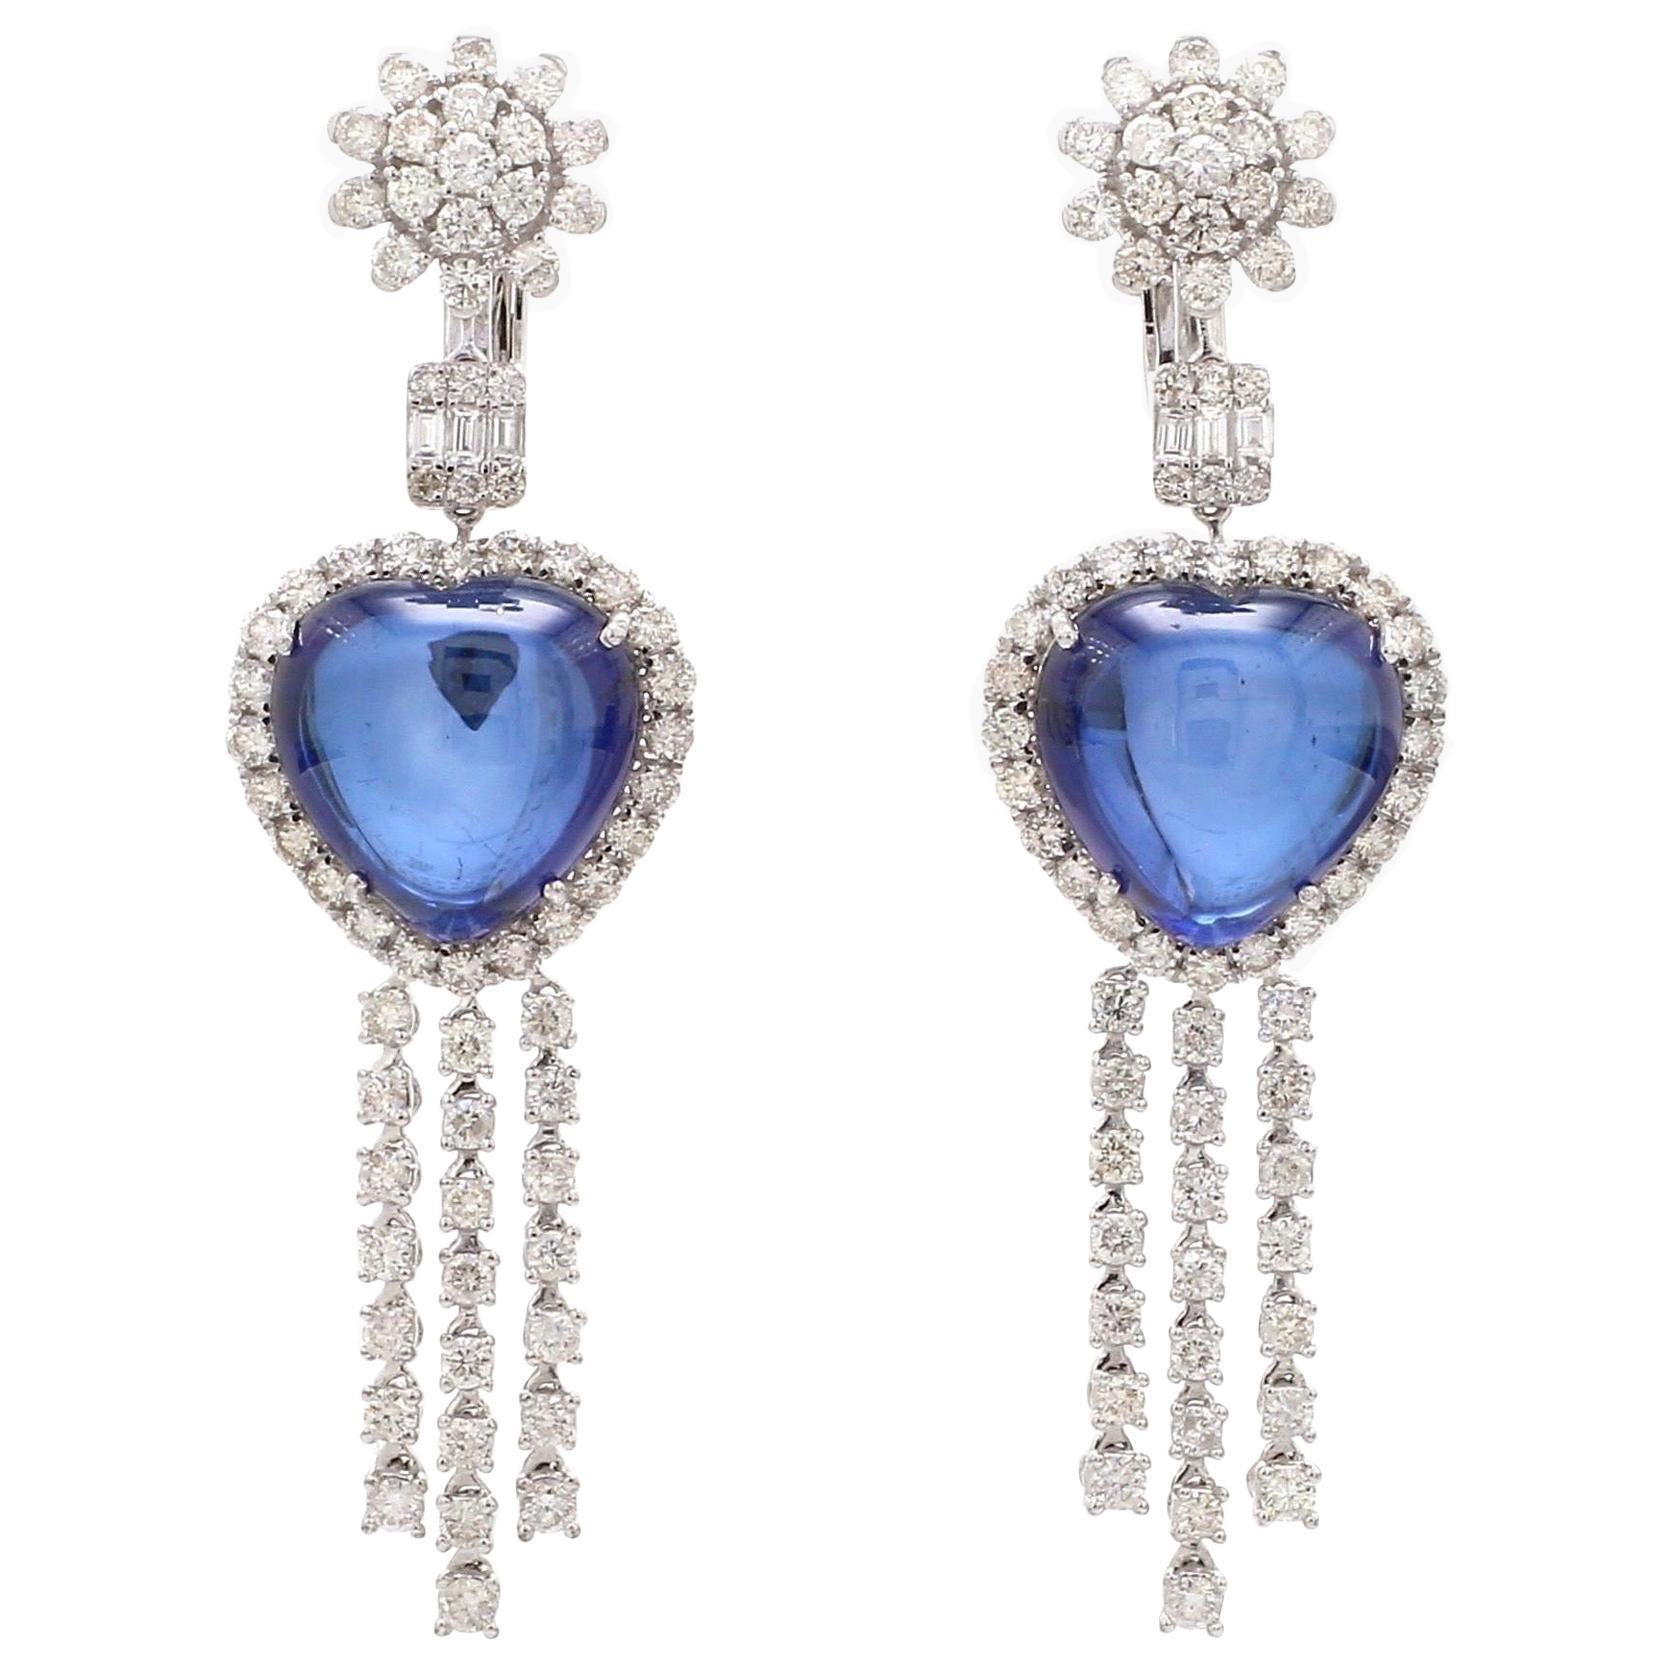 36.80 Carat Blue Sapphire Diamond 18 Karat Gold Heart Earrings